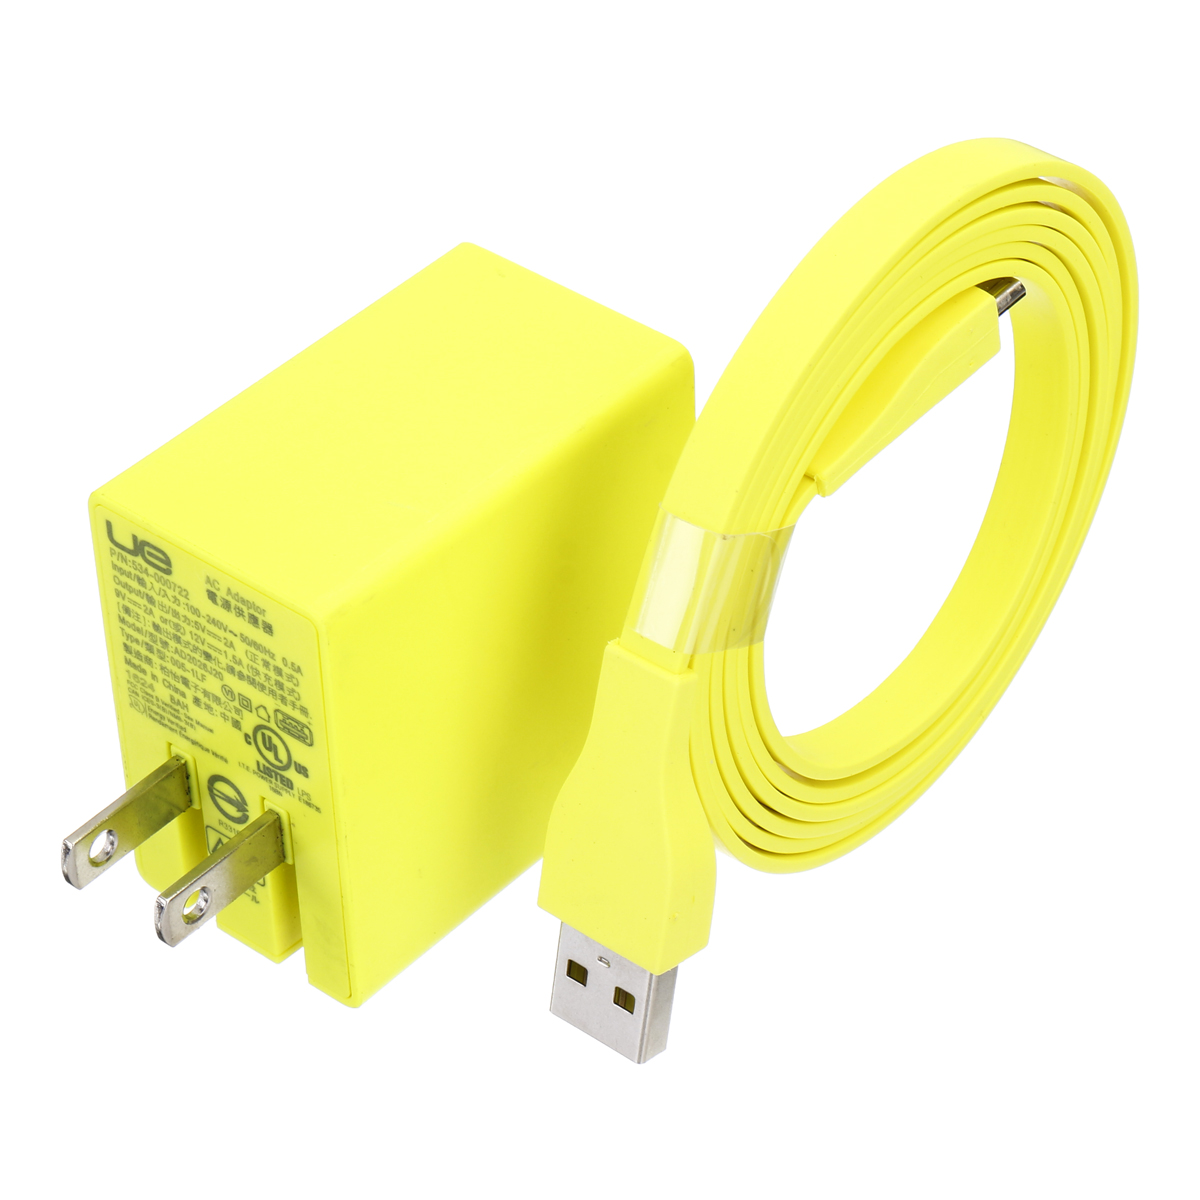 Inteligente Cargador Adaptador De Ca + Cable De Carga Cable Usb Amarillo Para Logitech Ue Boom Mega